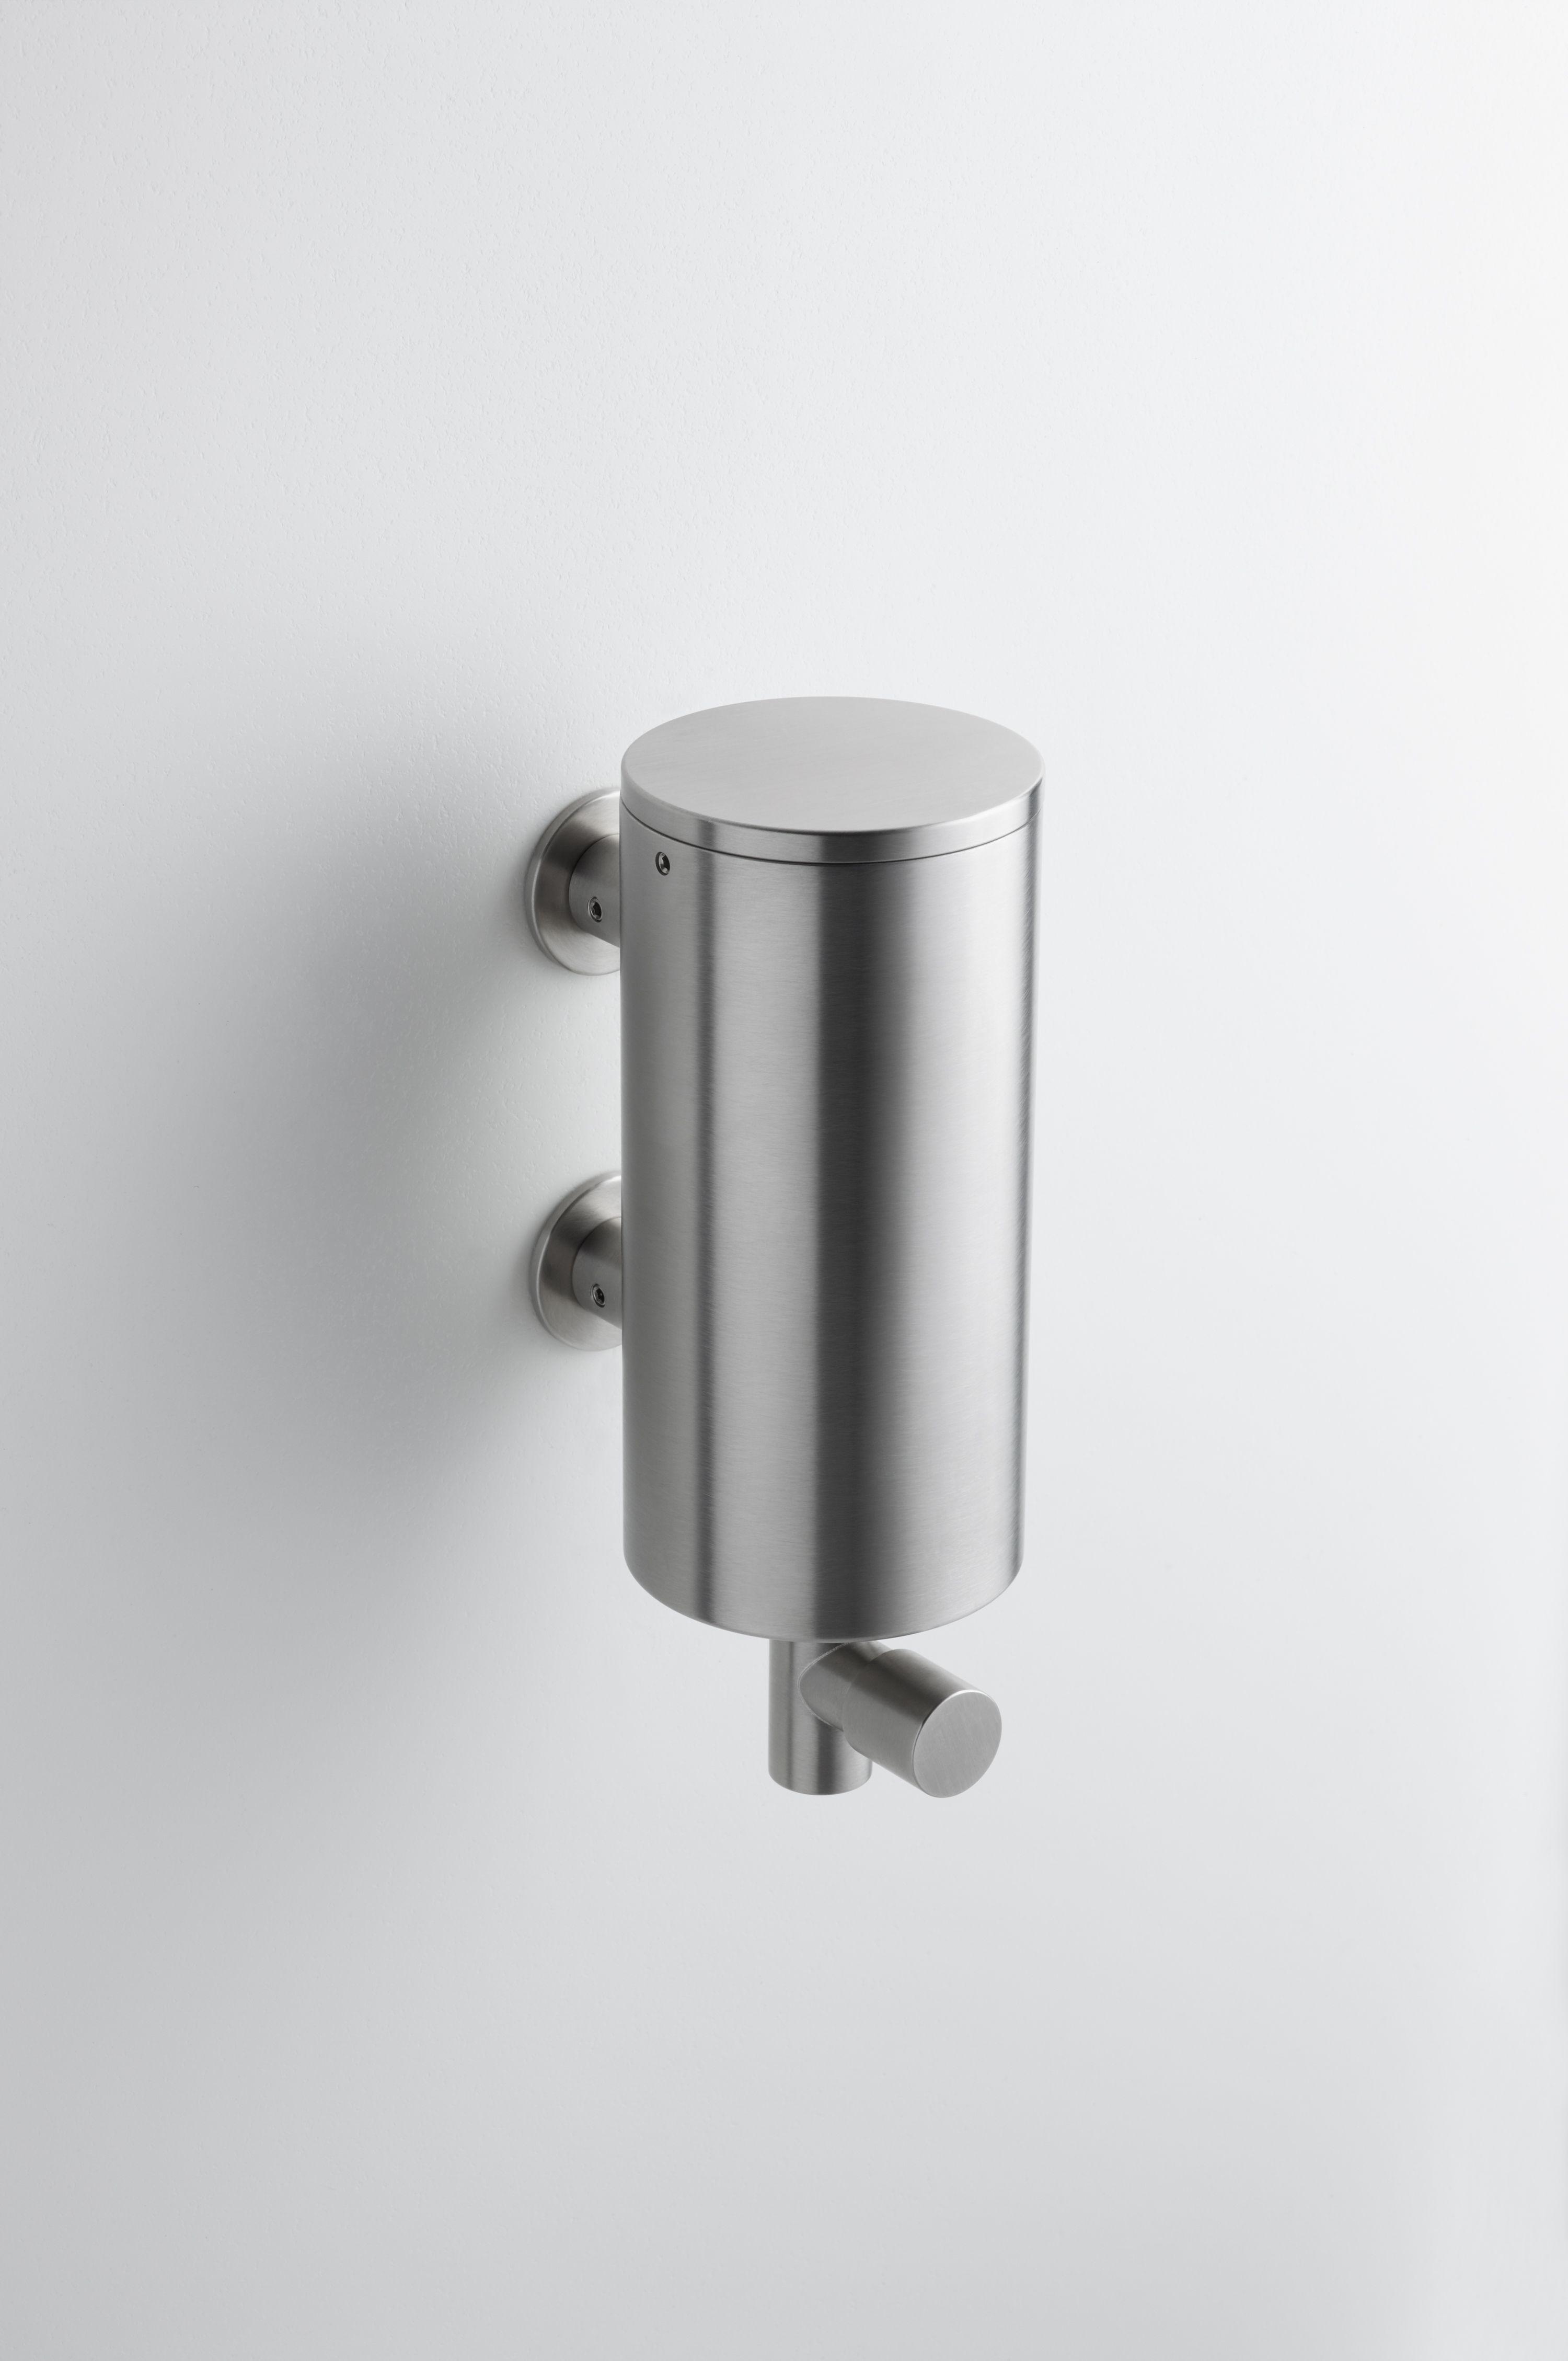 Wall Mounted Soap Dispenser Vola T10 Modern Bathroom Accessories Commercial Bathroom Designs Beautiful Bathroom Designs